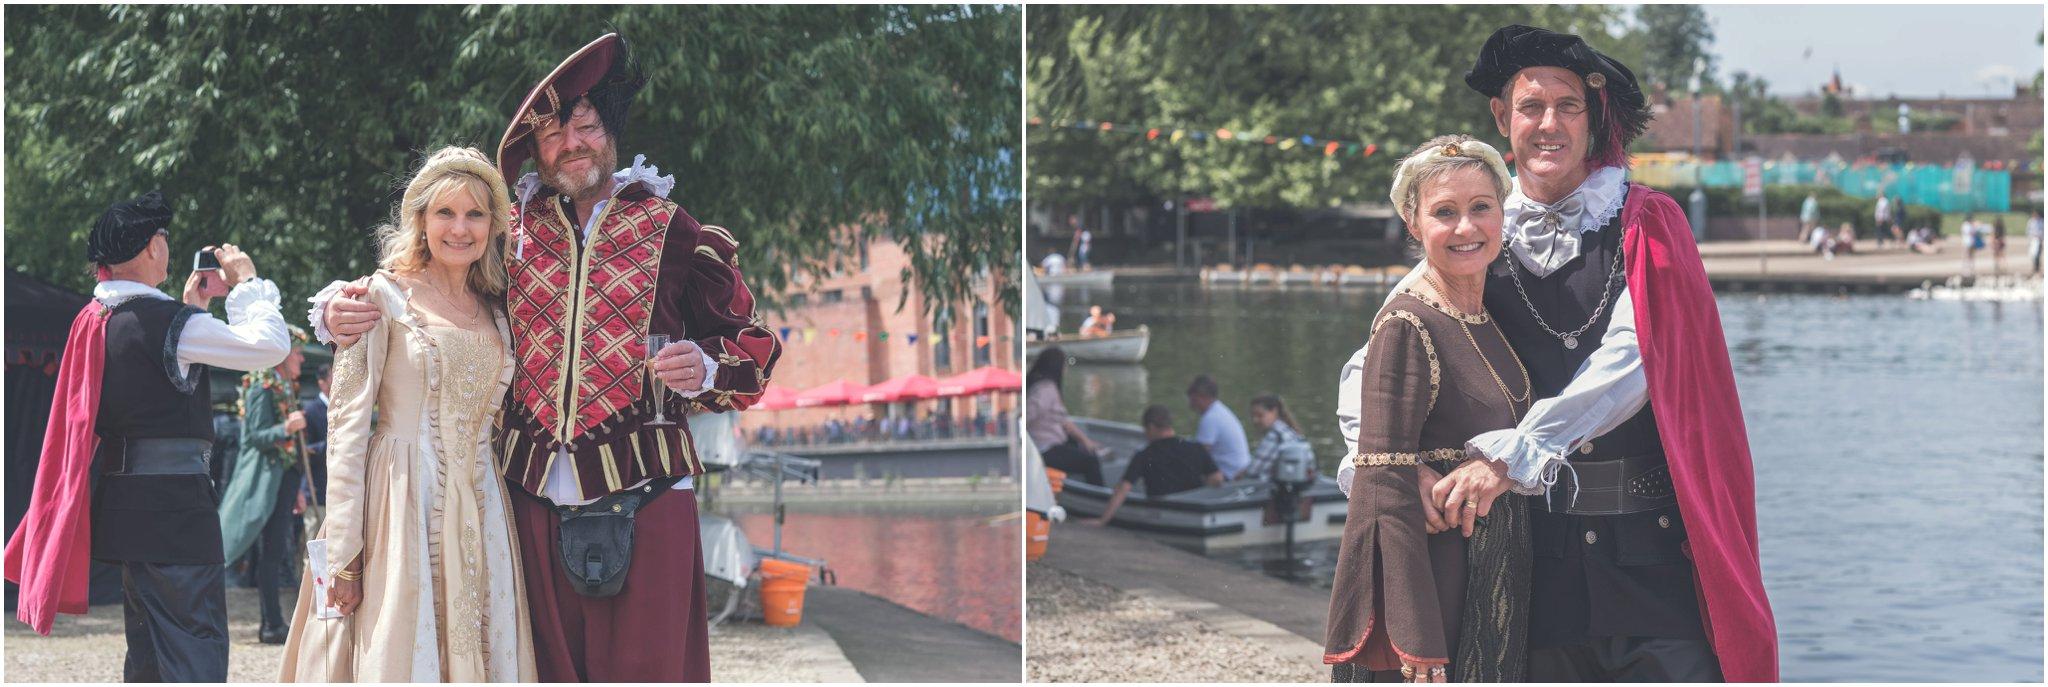 Stratford-Upon-Avon-Wedding - Robin Ball Photography-63.jpg